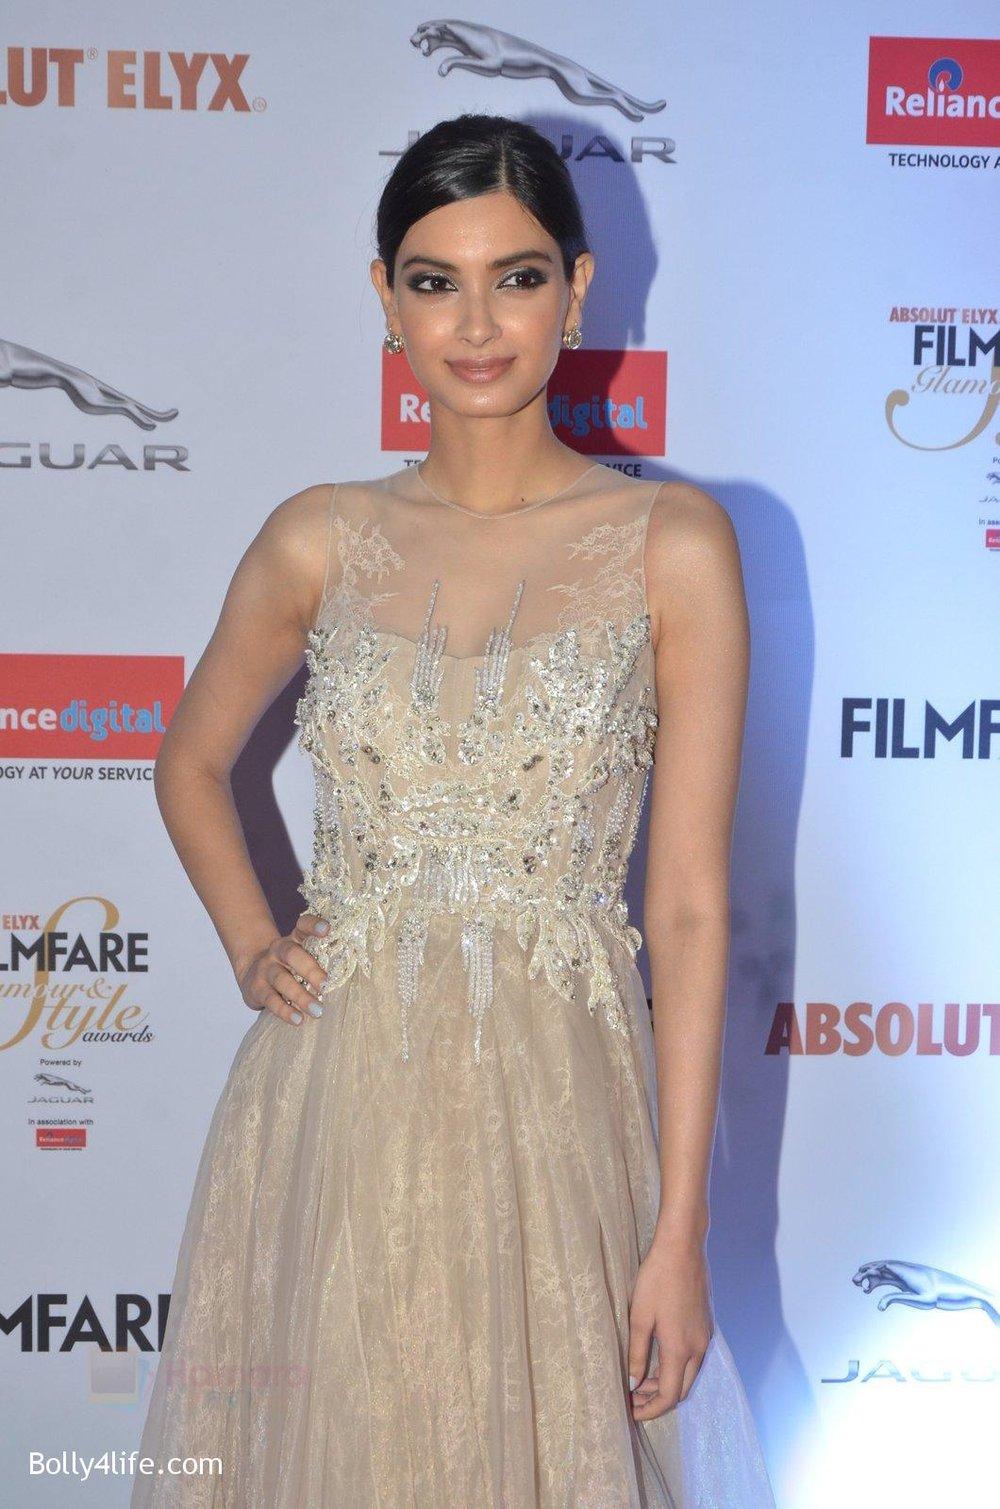 Diana-Penty-at-Filmfare-Glamour-Style-Awards-2016-in-Mumbai-on-15th-Oct-2016-1807.jpg